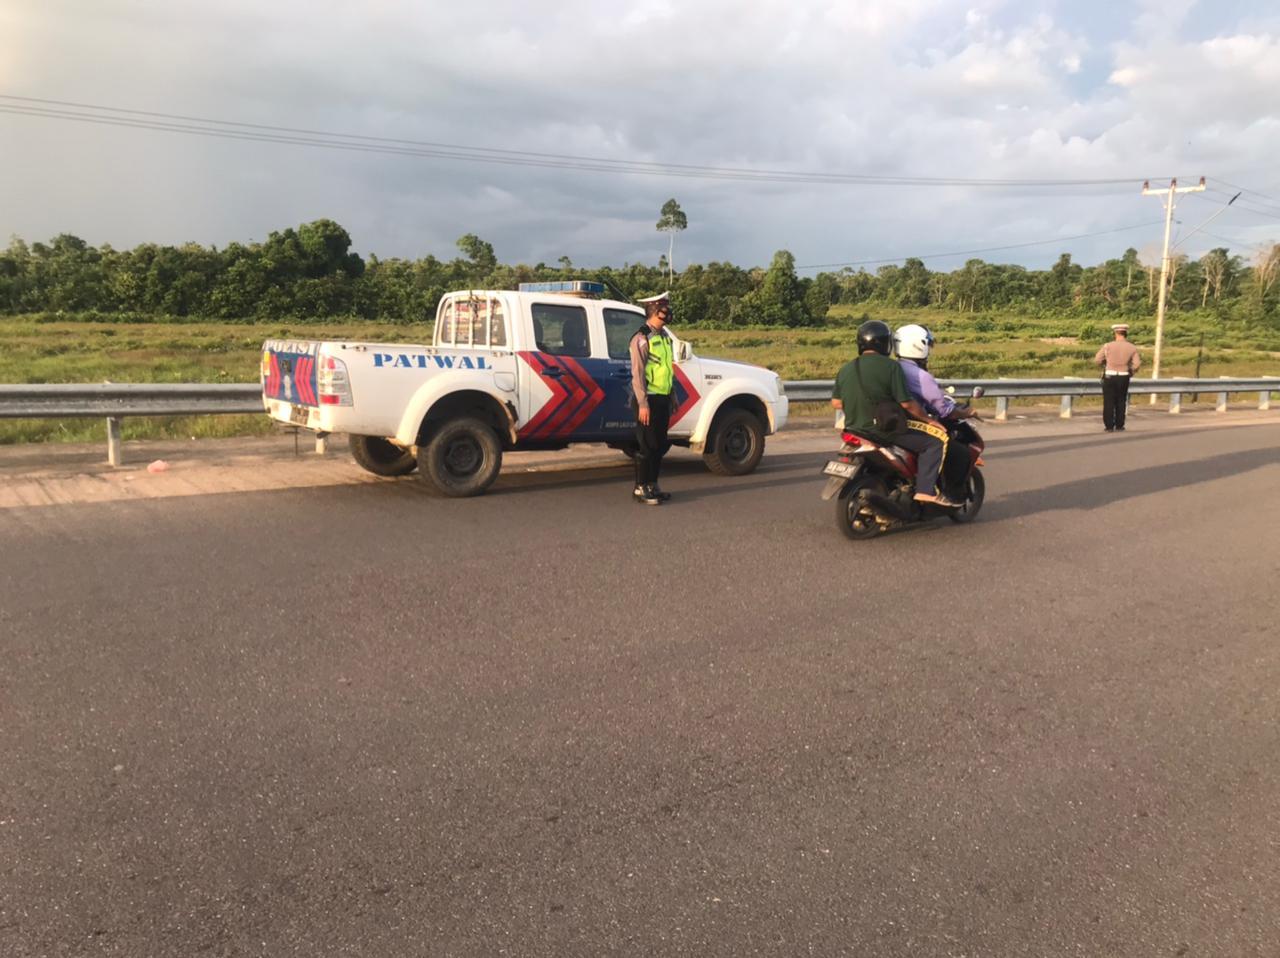 Patroli Jembatan Pawan 5 Gagalkan Aksi Balap Liar Yang Meresahkan